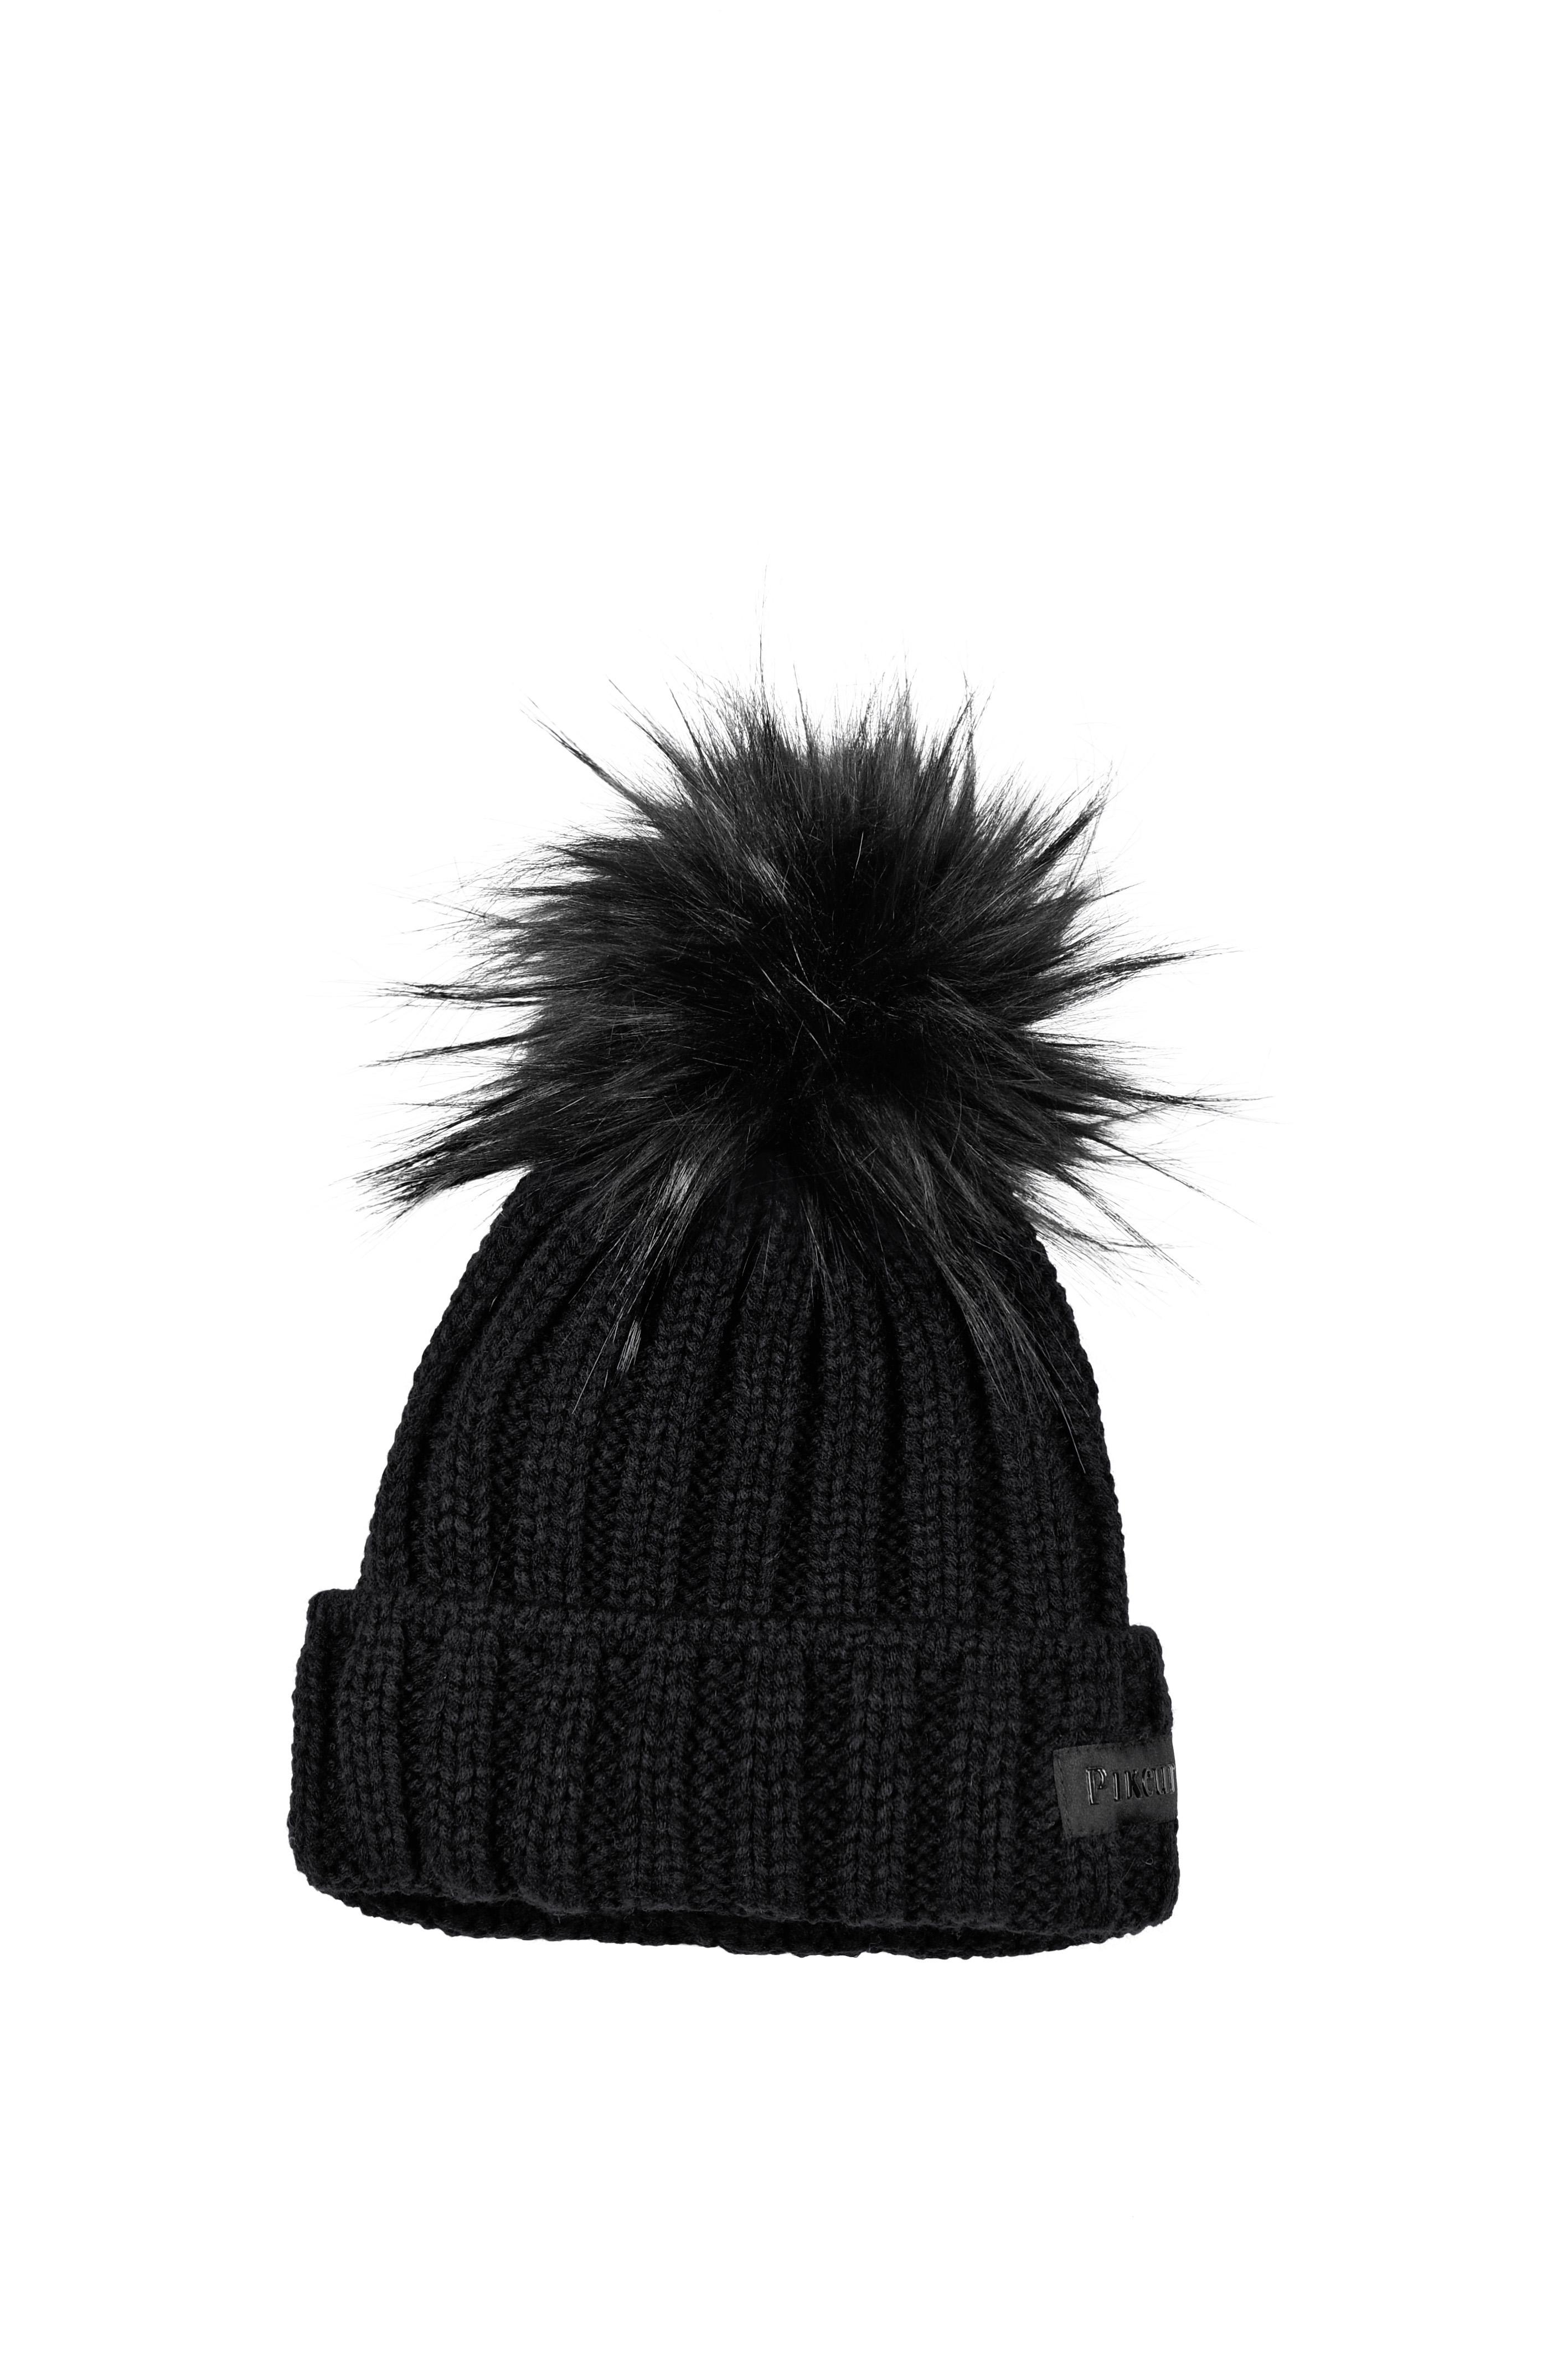 Pikeur Mutze NG New Generation Black Bobble Hat